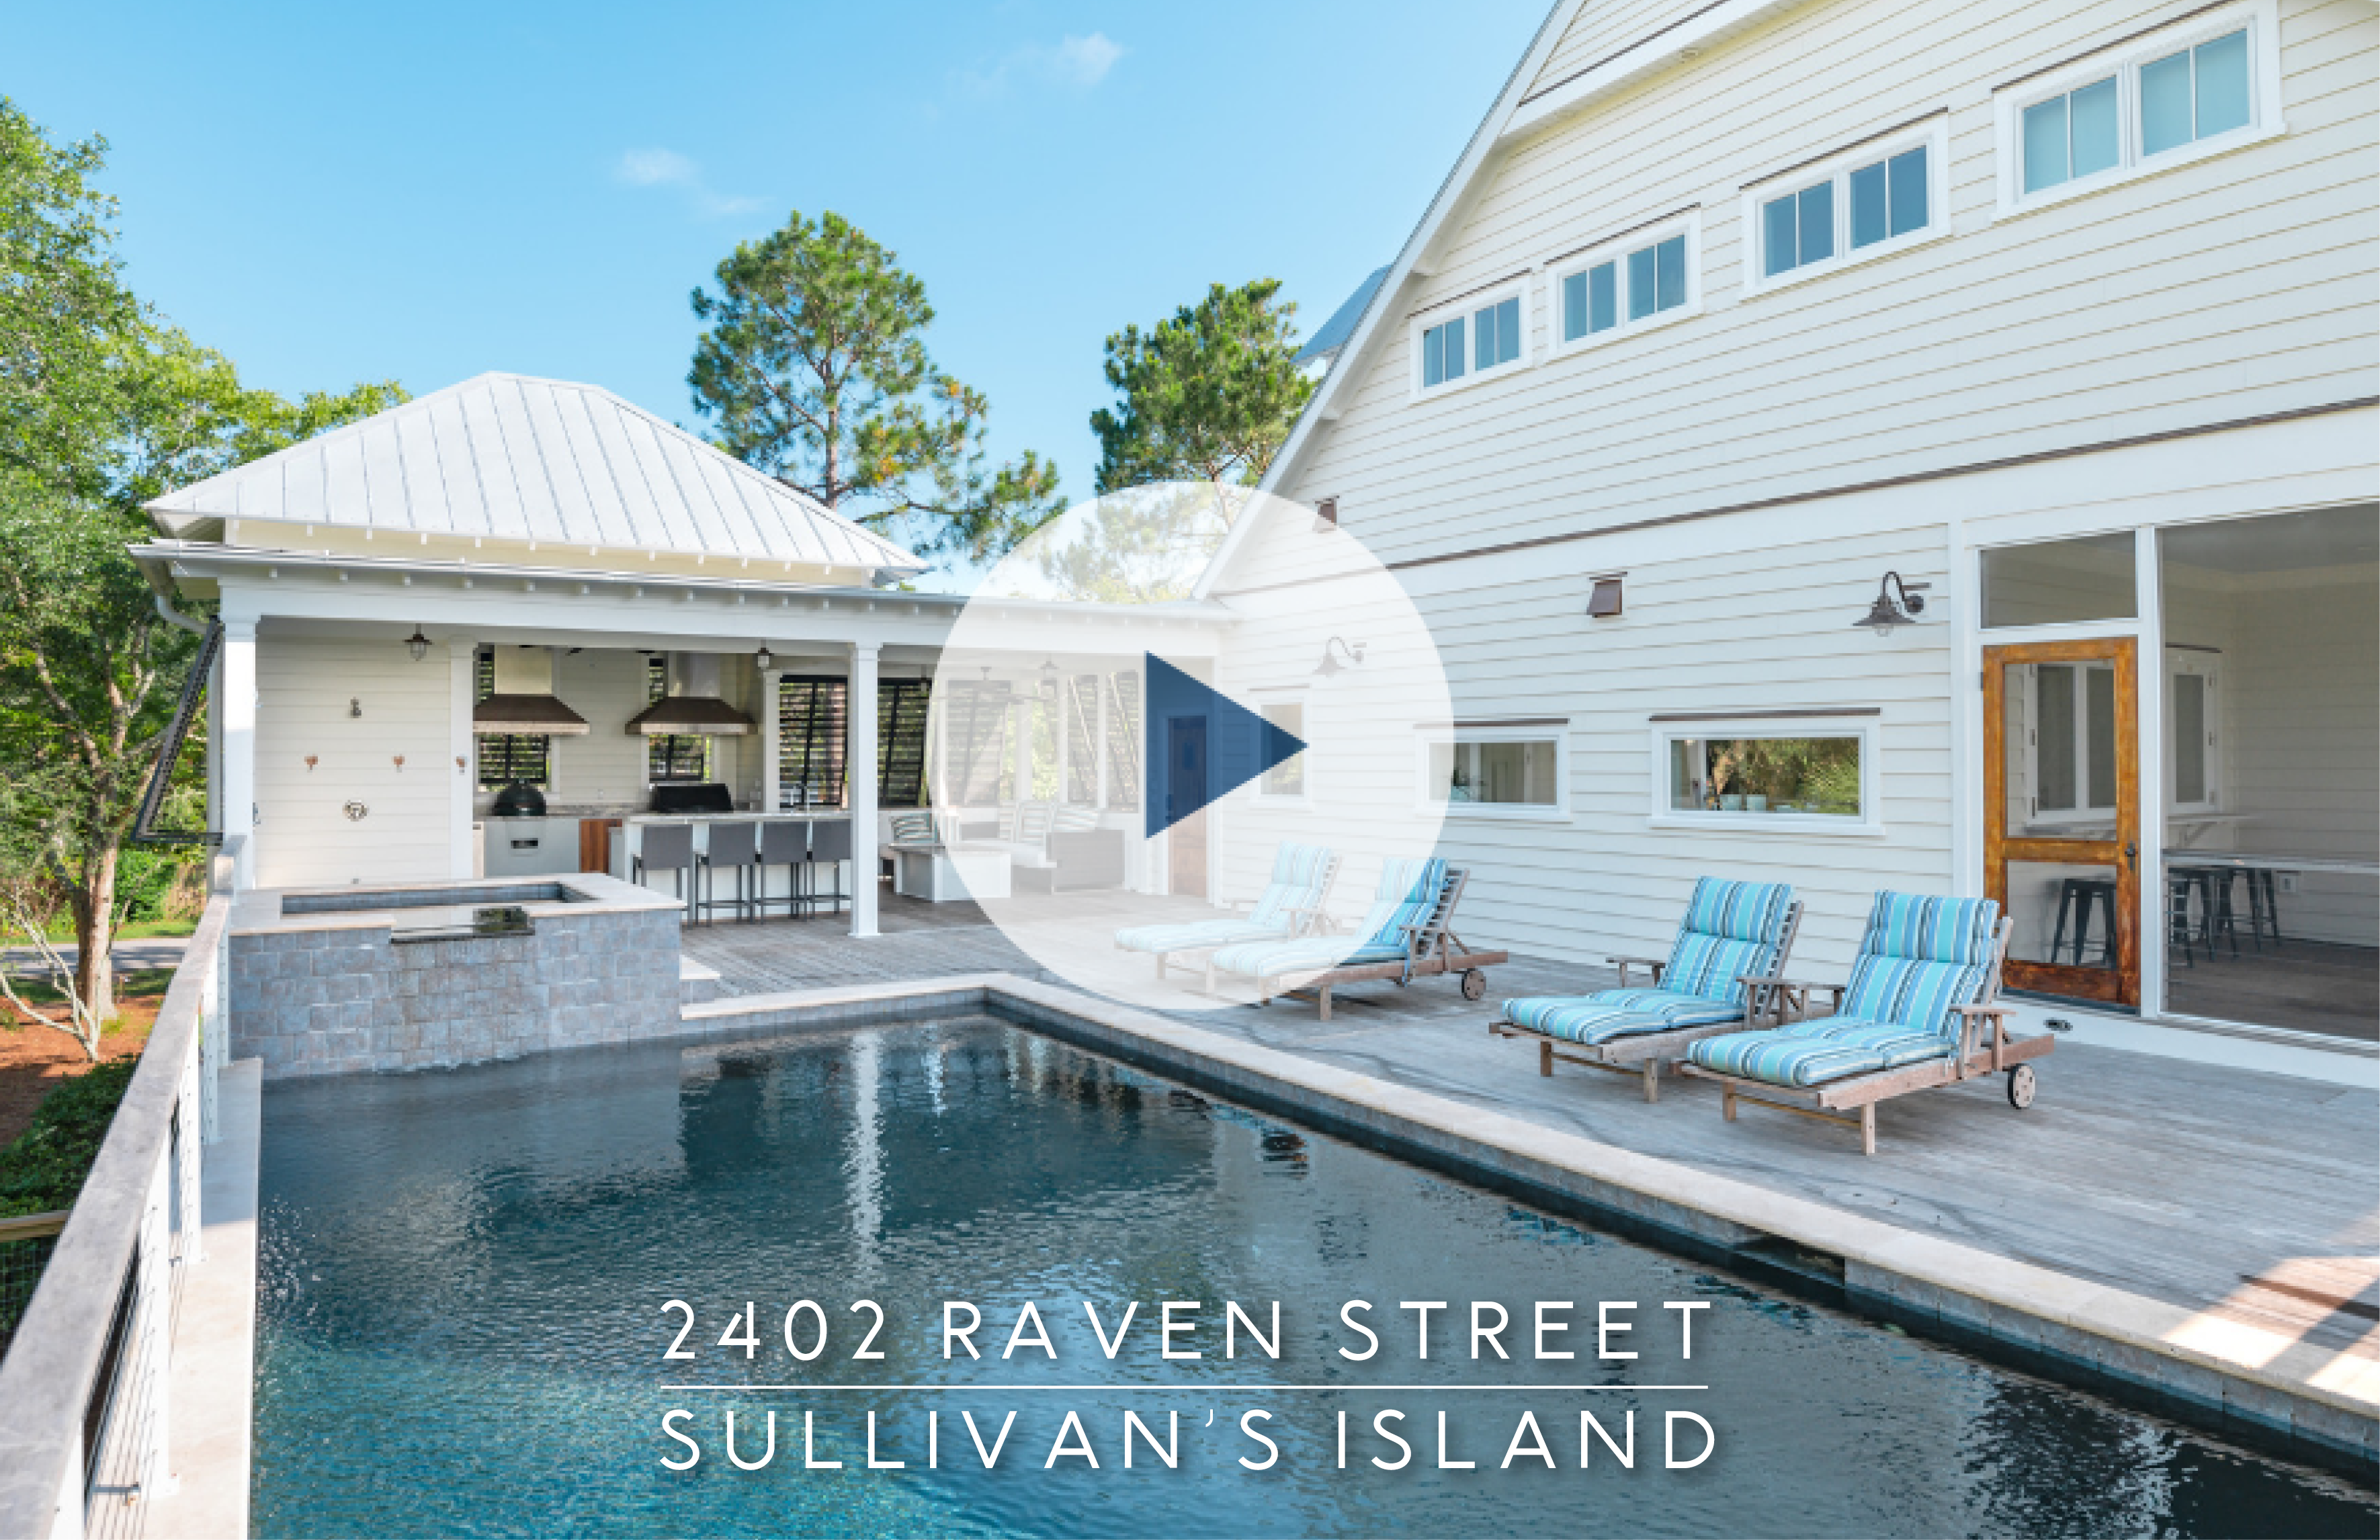 2402 Raven Street, Sullivans Island SC